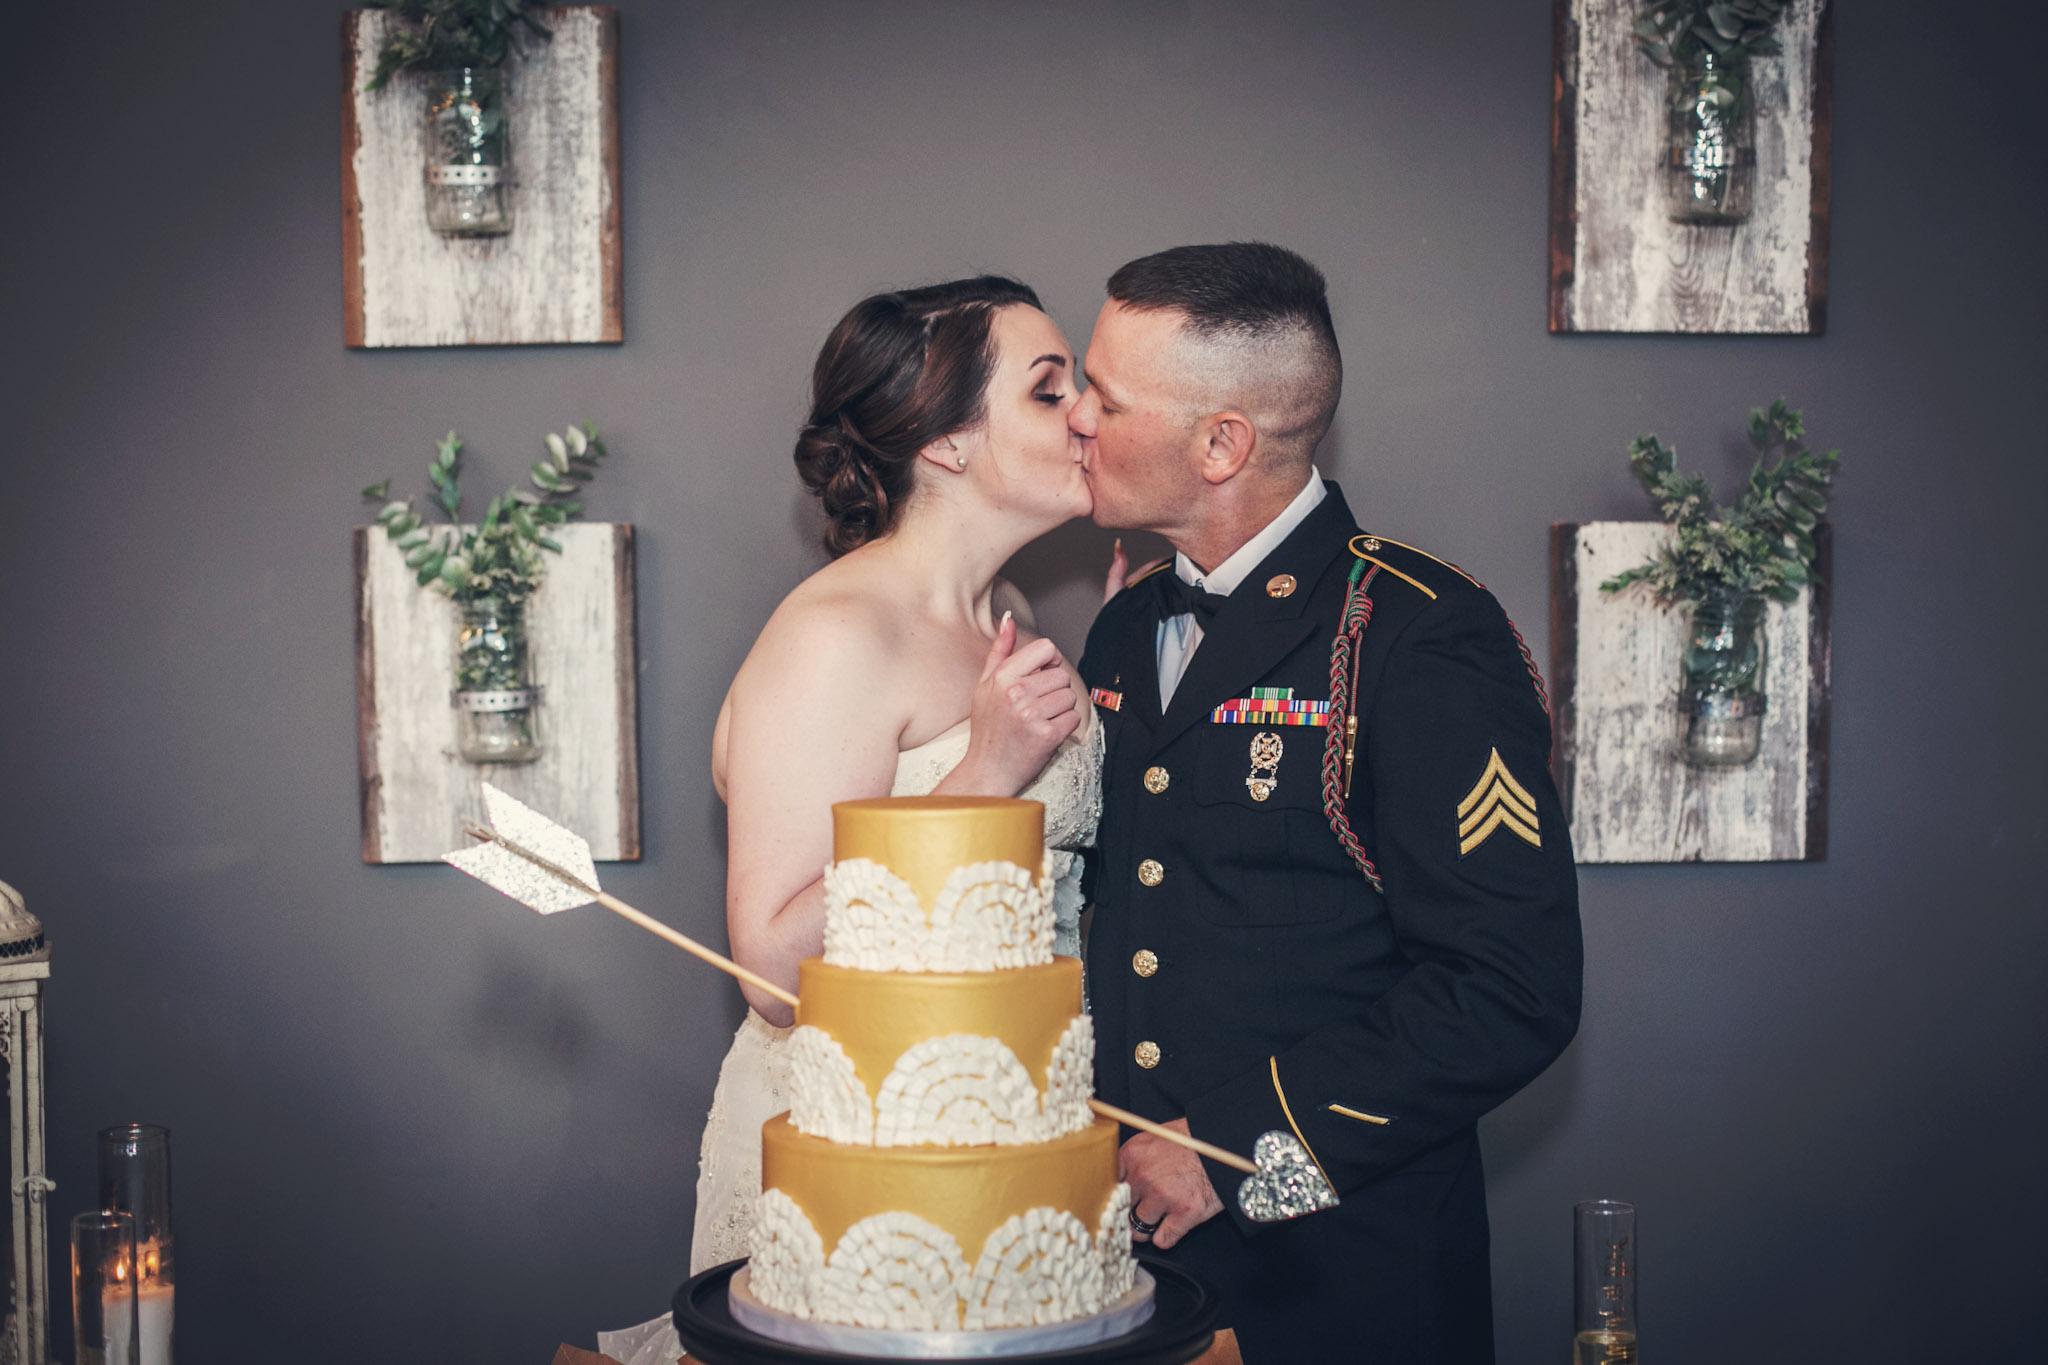 Kansas_City_Small_Intimate_Budget_Wedding_Venue_Andrew&Sydney_192b.jpg